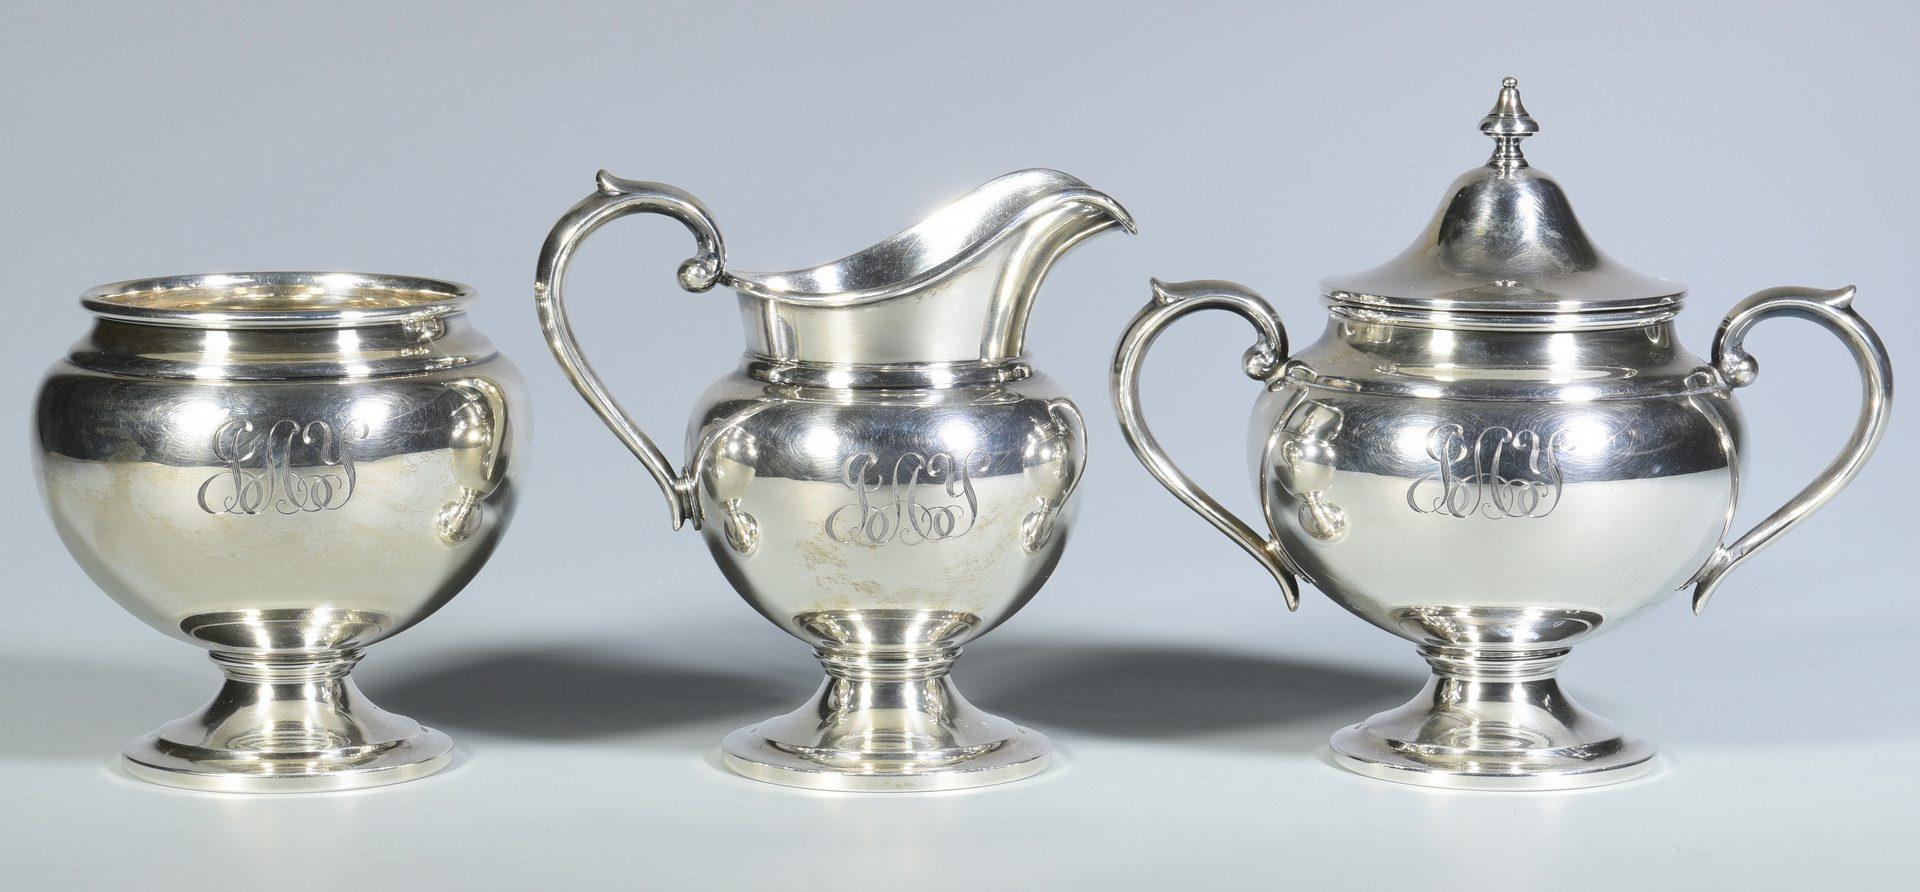 Lot 446: Gorham Sterling Silver Tea Service, 5 pcs